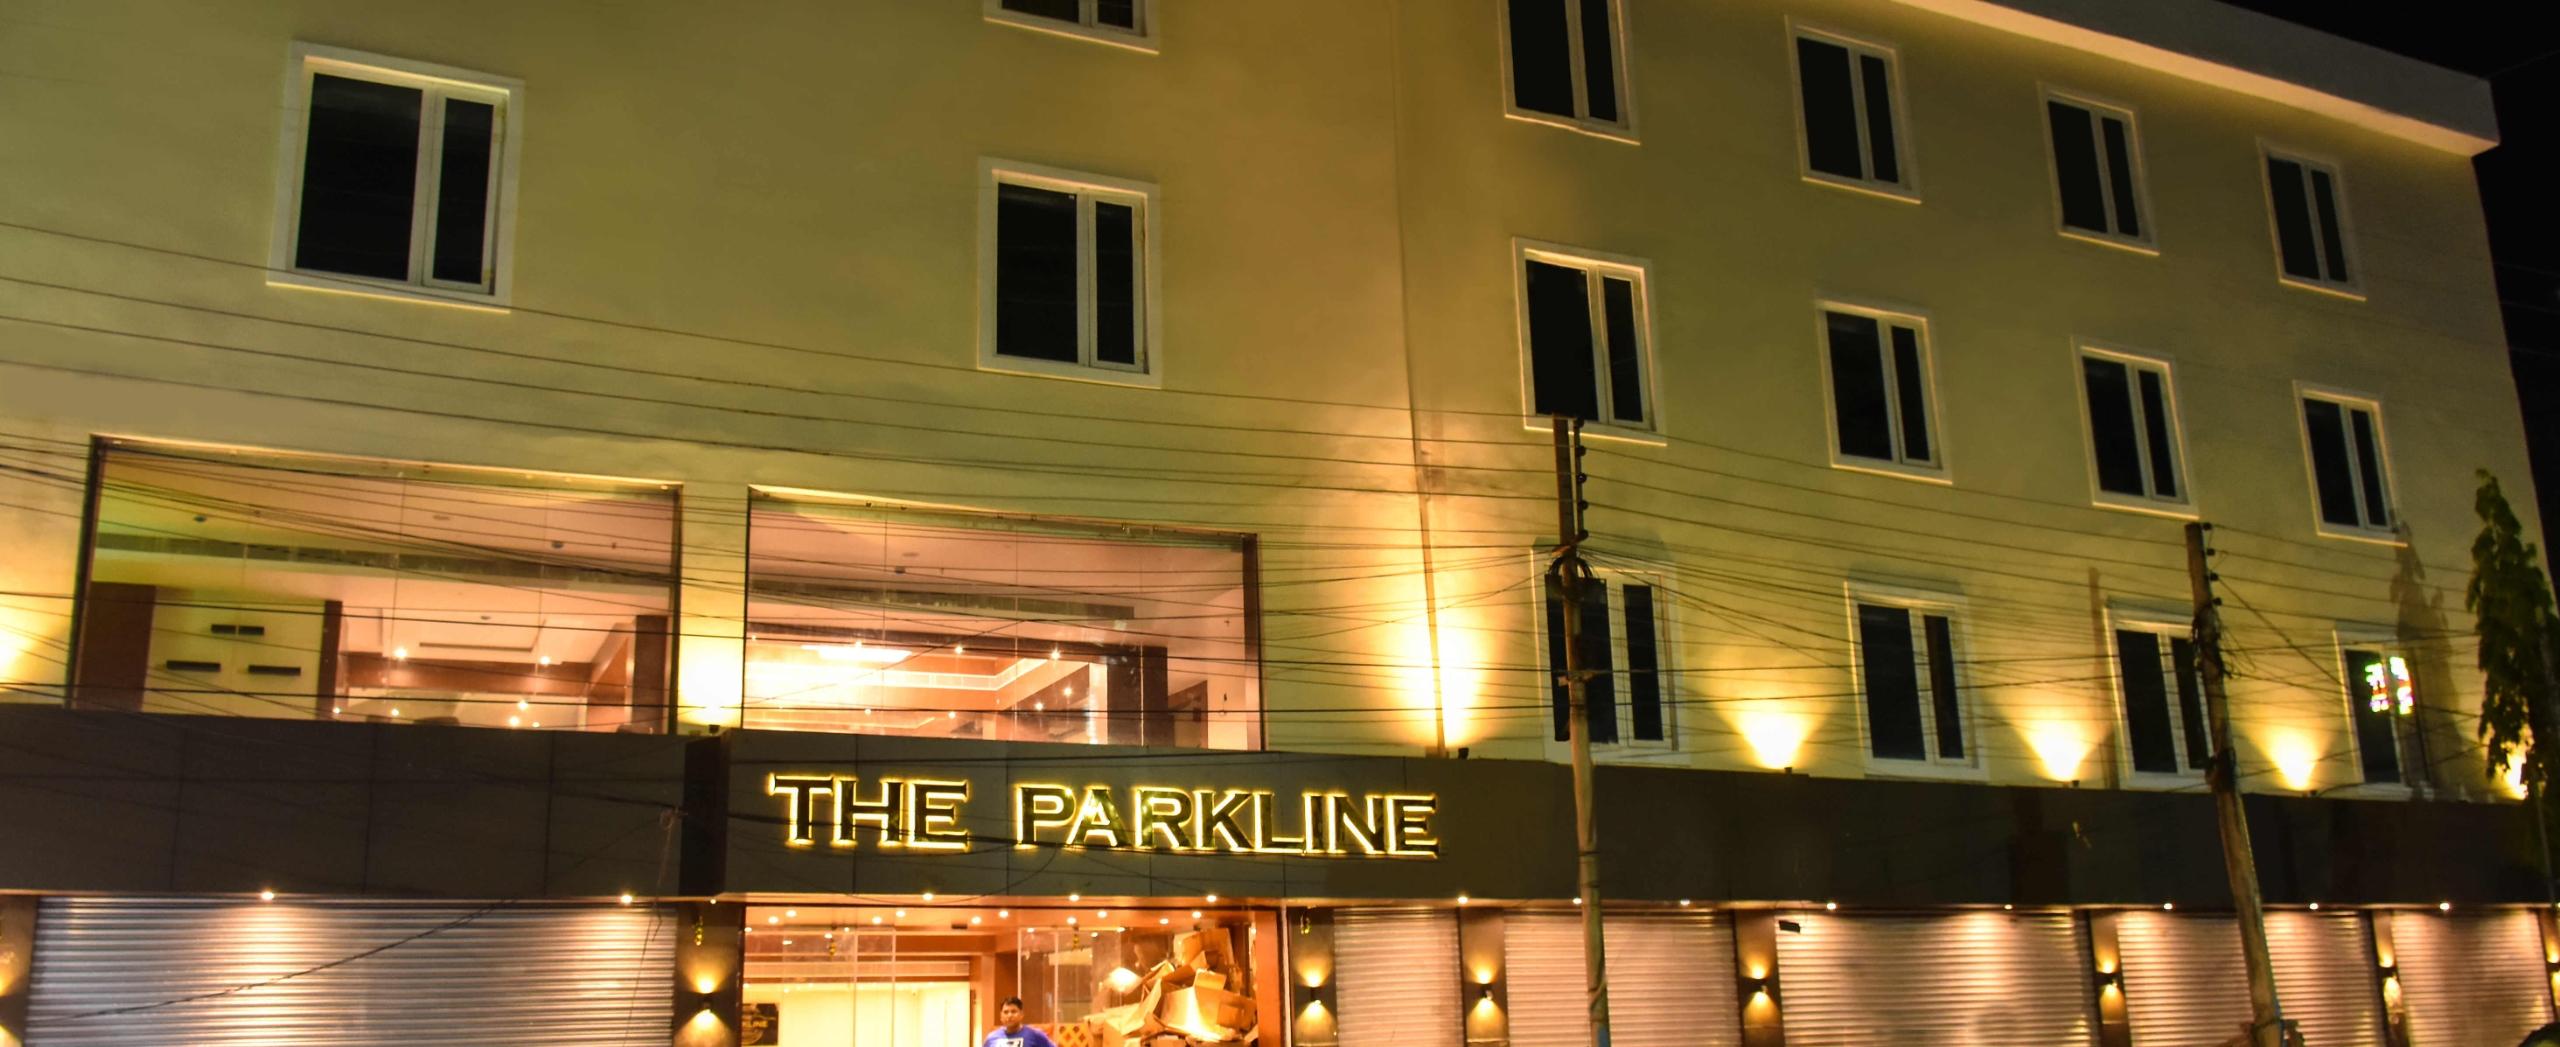 THE PARKLINE (@theparkline) Cover Image